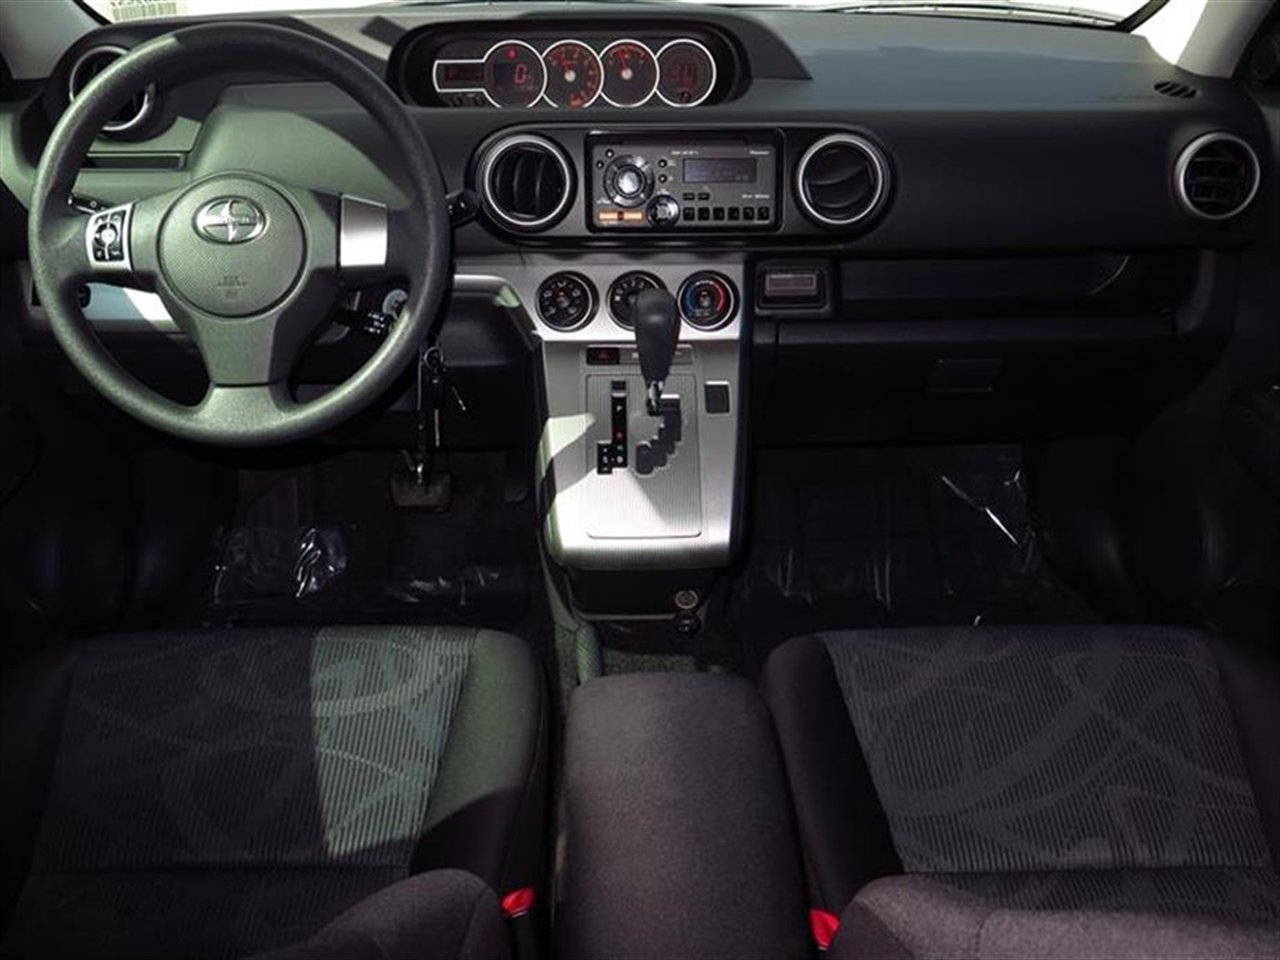 2012 SCION XB 5dr Wgn Auto 31917 miles 6040 split fold flat rear seat wunder-seat storage tray